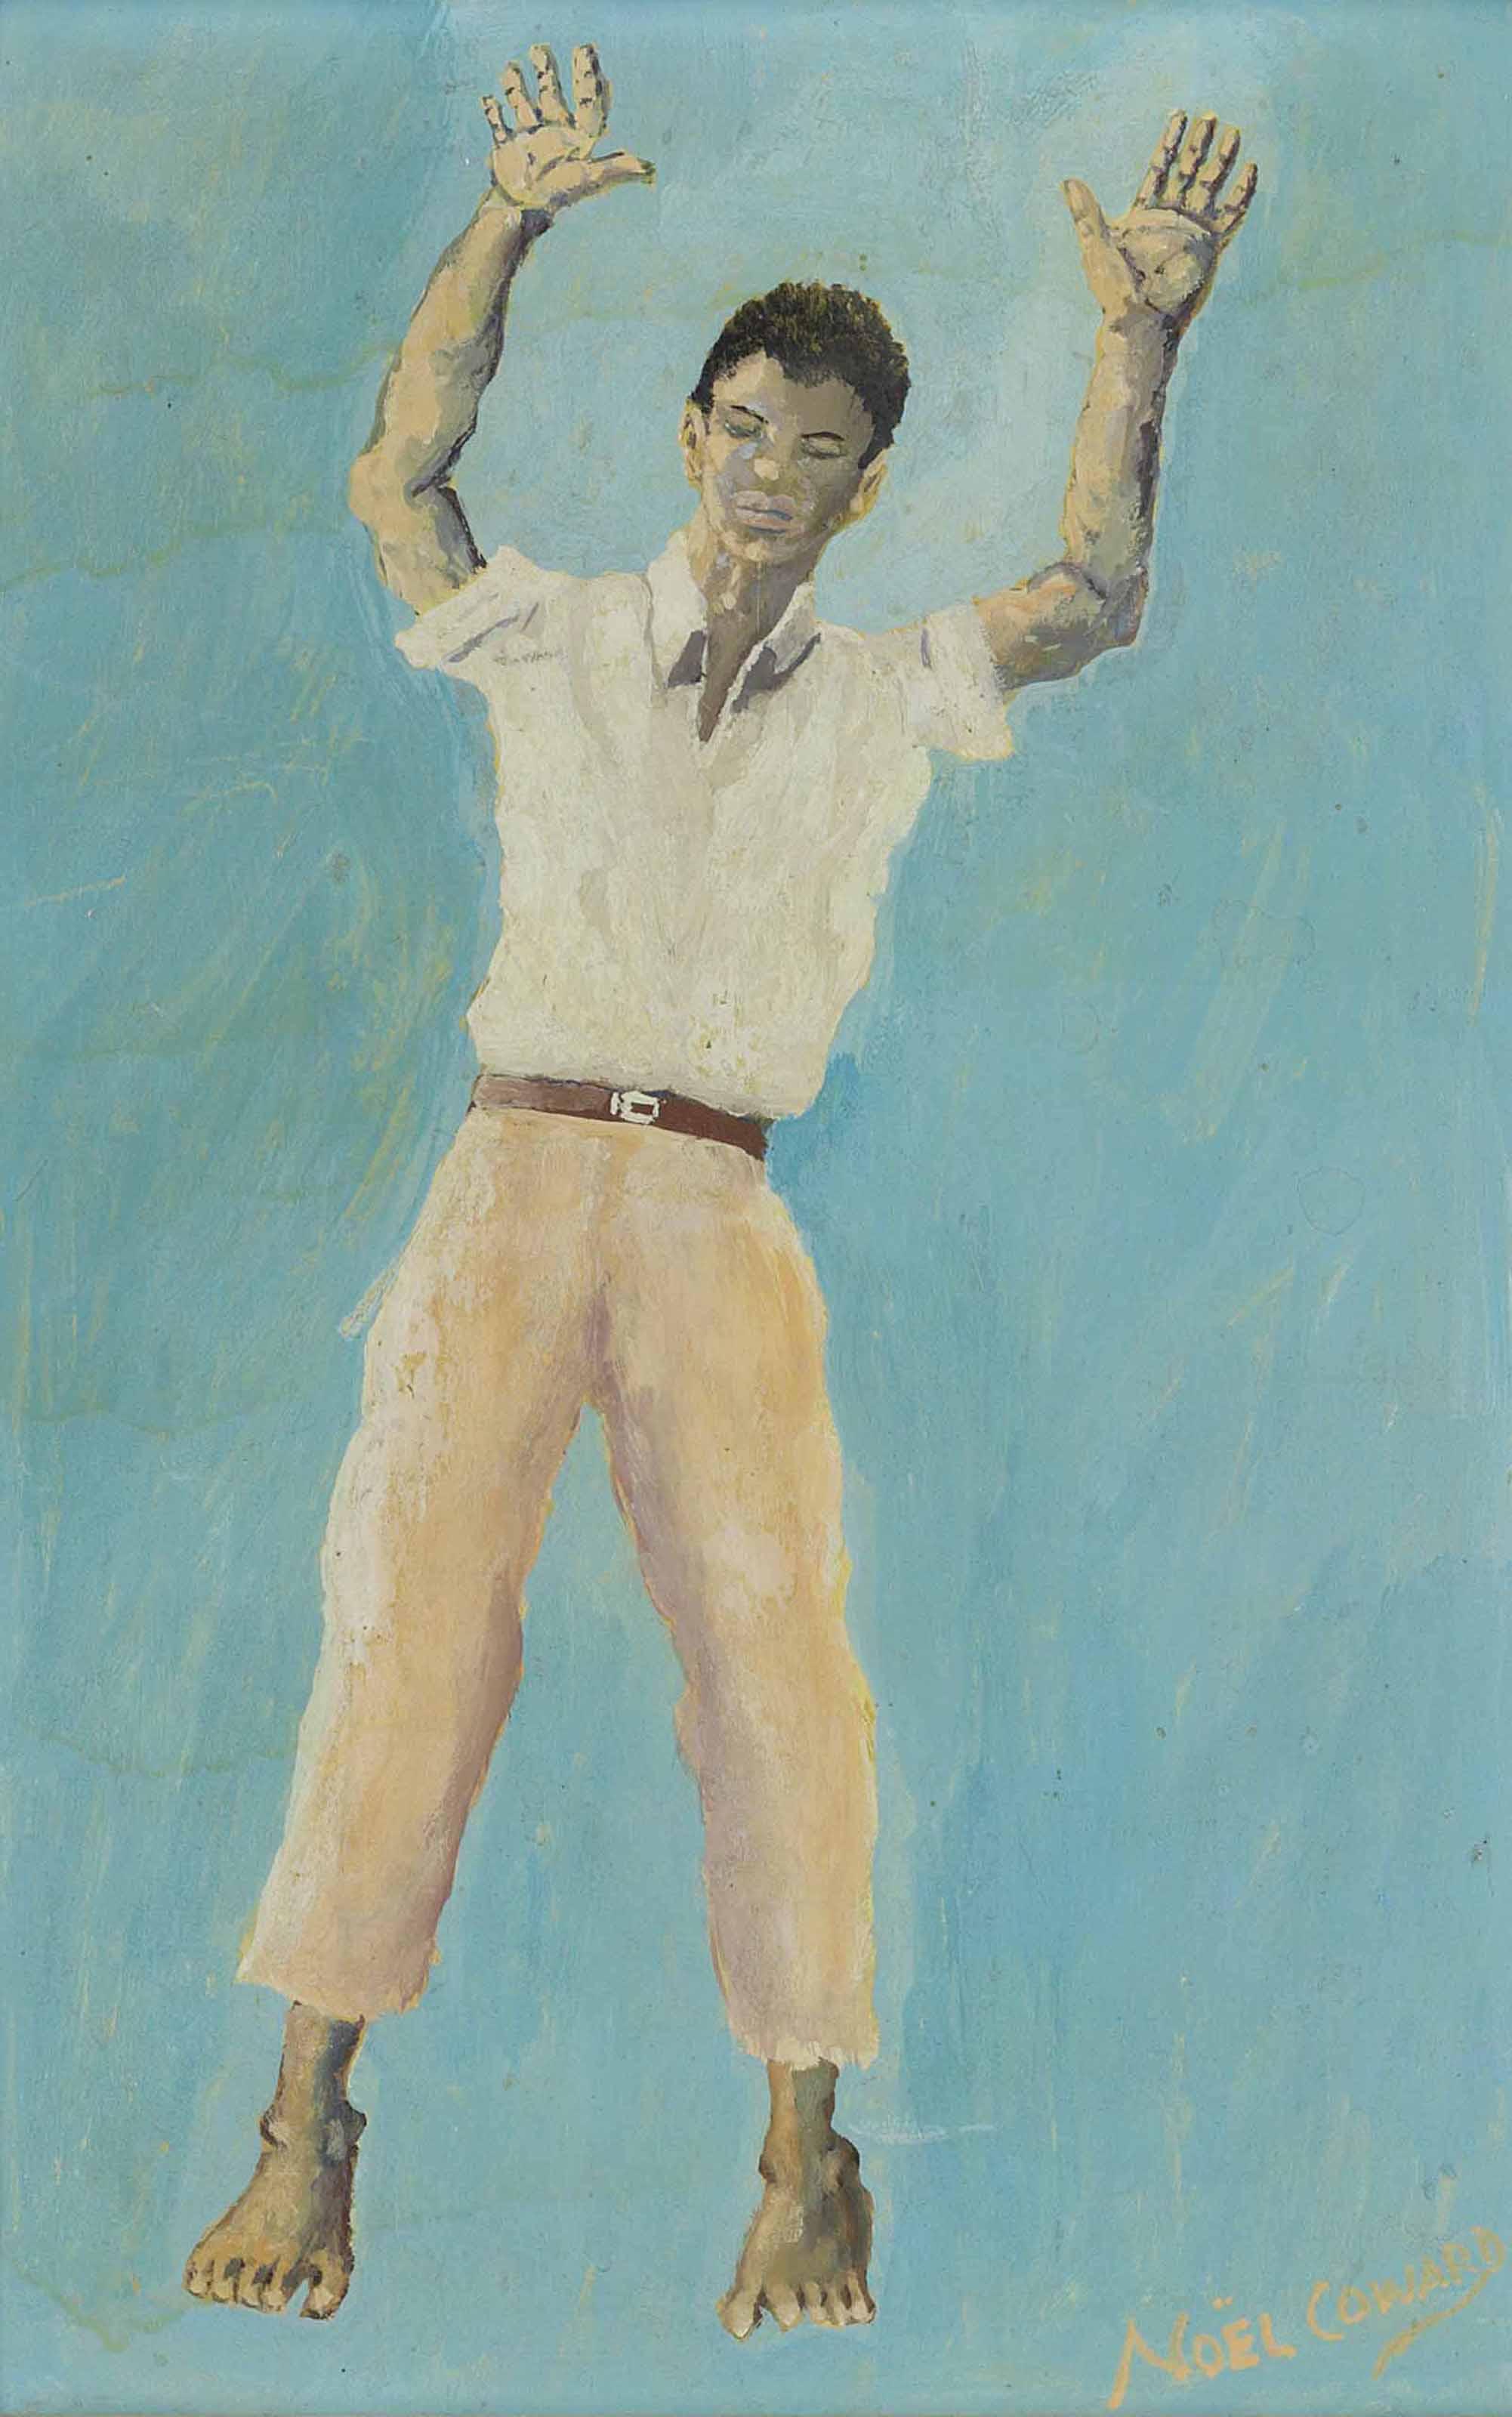 SIR NOËL COWARD (BRITISH, 1899